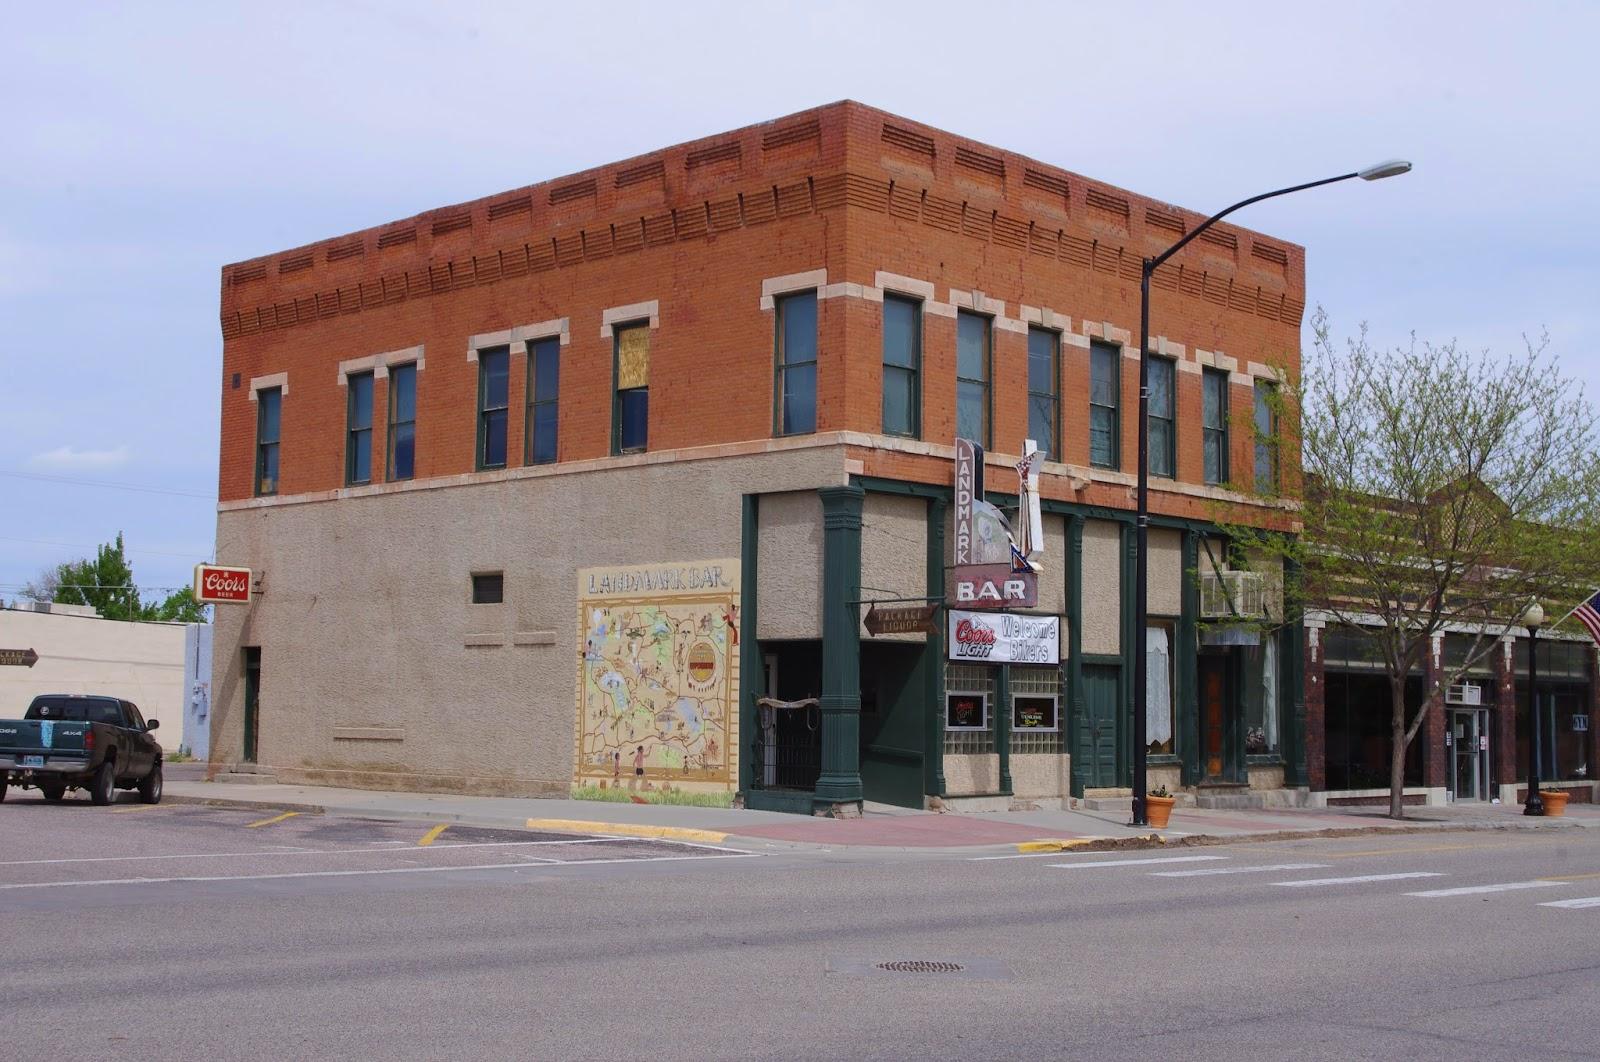 Painted Bricks: Landmark Bar, Wheatland Wyoming